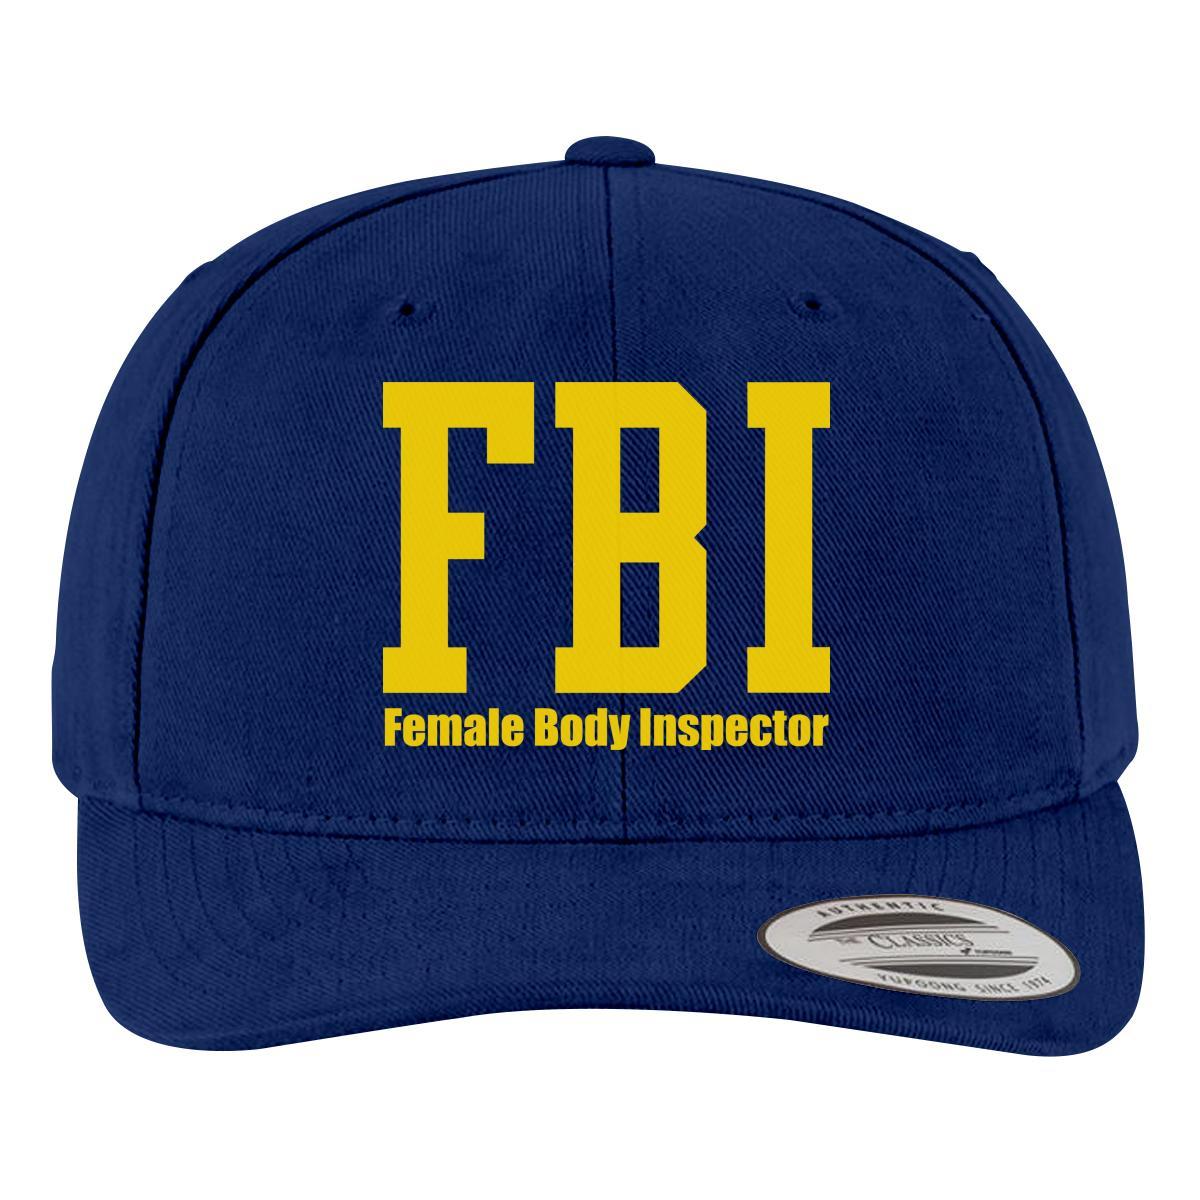 Funny FBI Brushed Cotton Twill Hat  68112fbd409